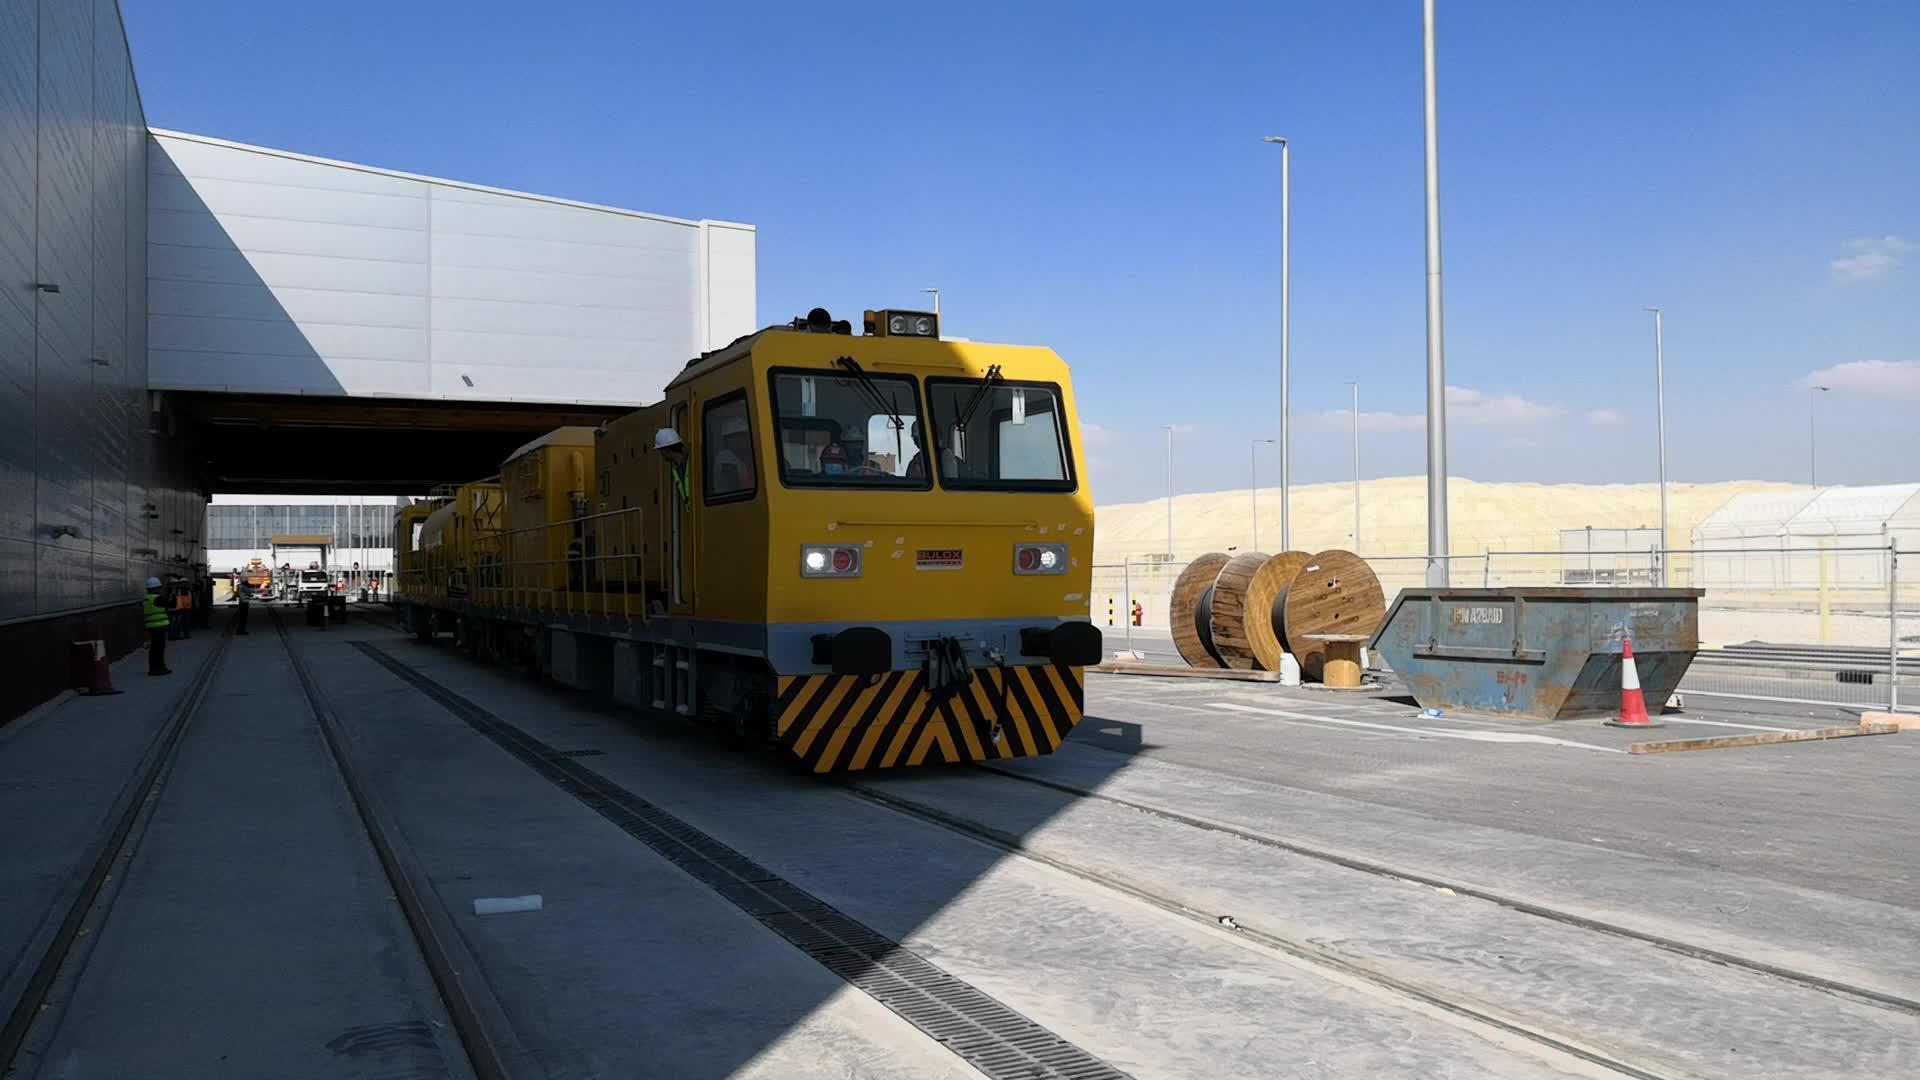 Railteco Customized Railway Tunnel Cleaning Vehicle